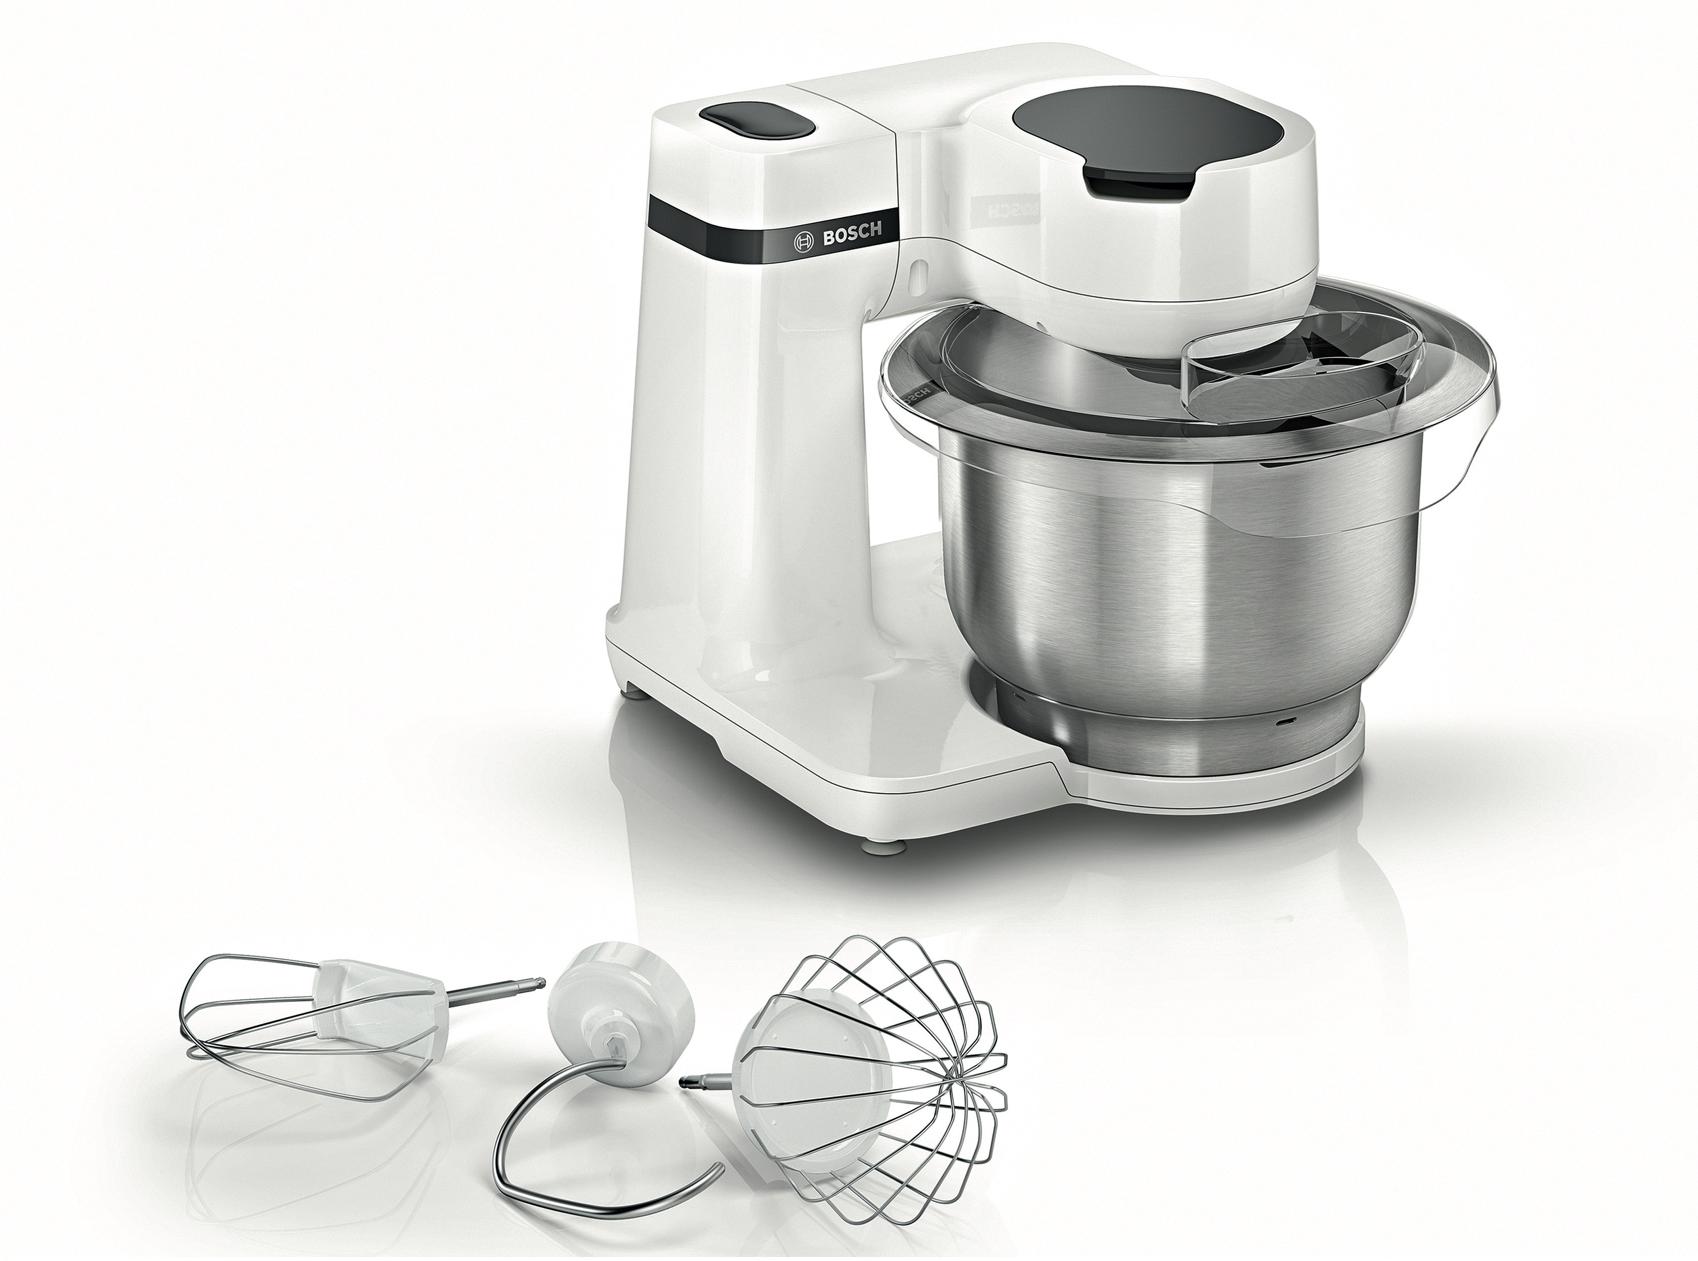 Bosch Kuchenmaschine Mum Serie 2